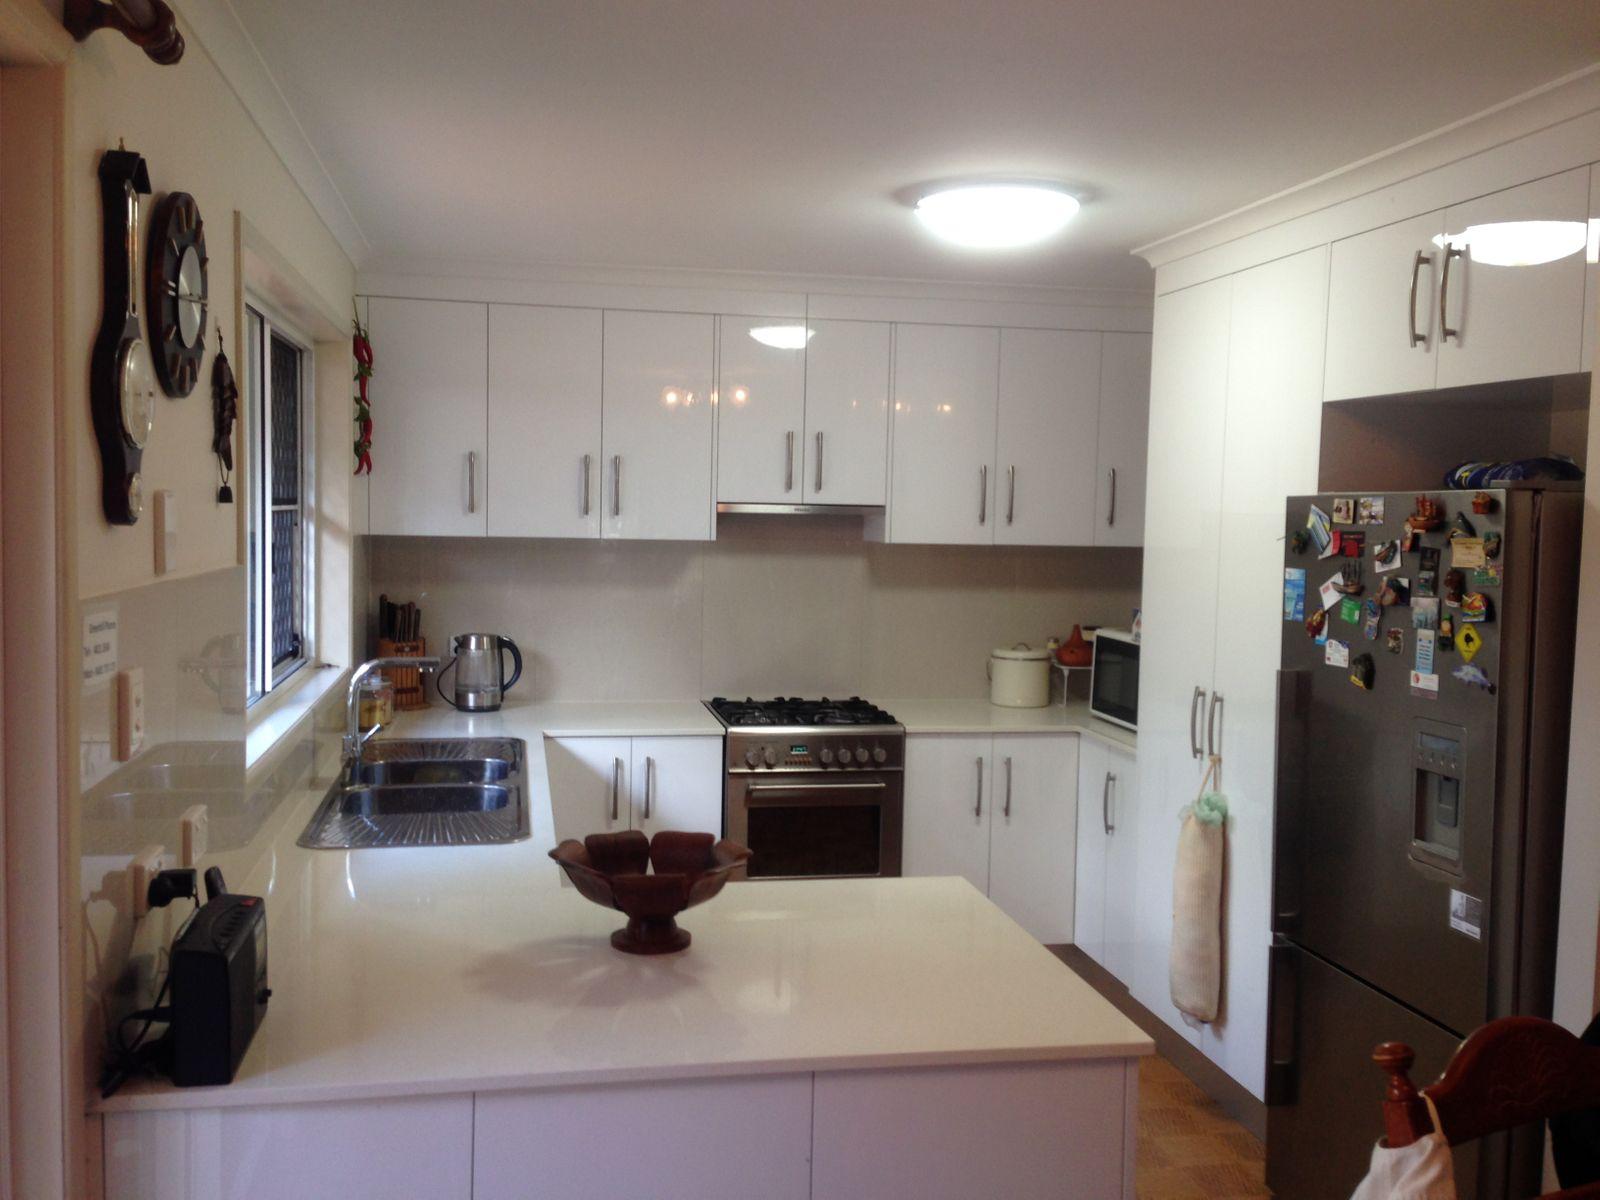 1 Pacific Avenue, Ilbilbie, QLD 4738